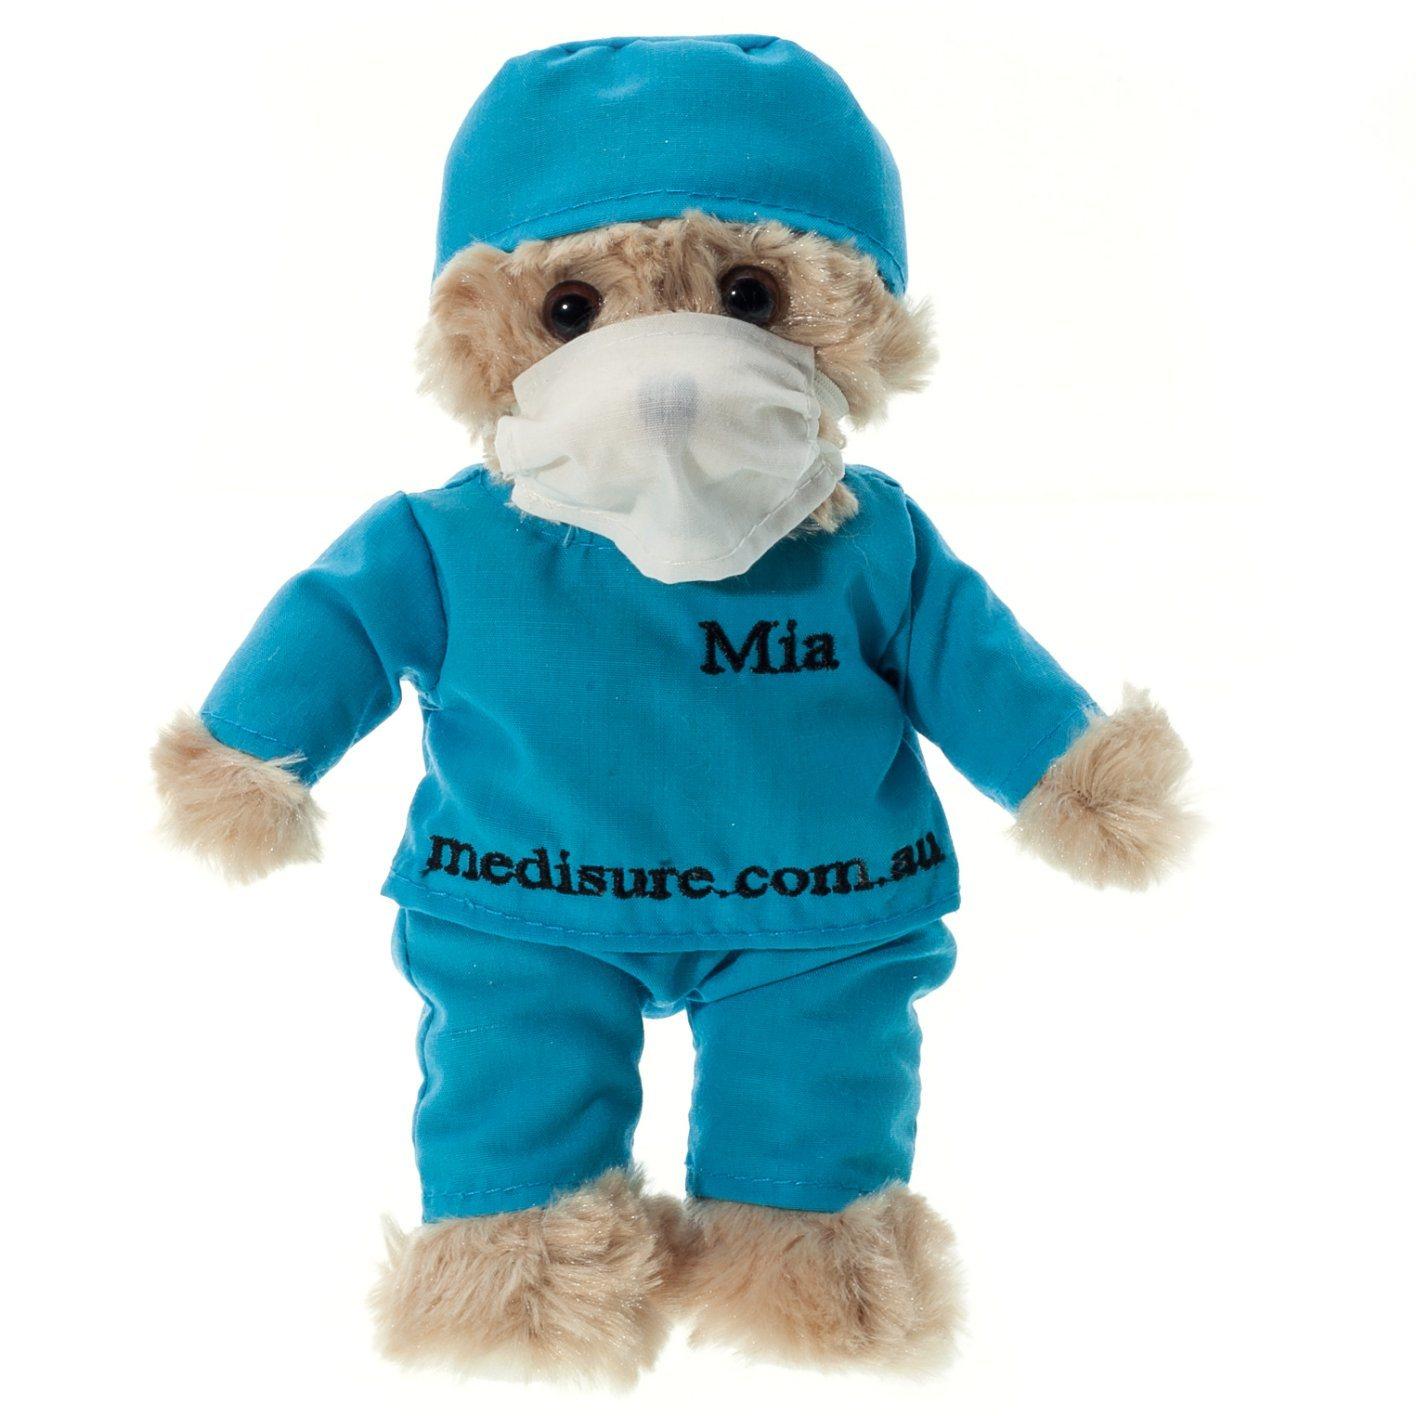 Custom Made Super Soft Stuffed Doctor Plush Teddy Bear